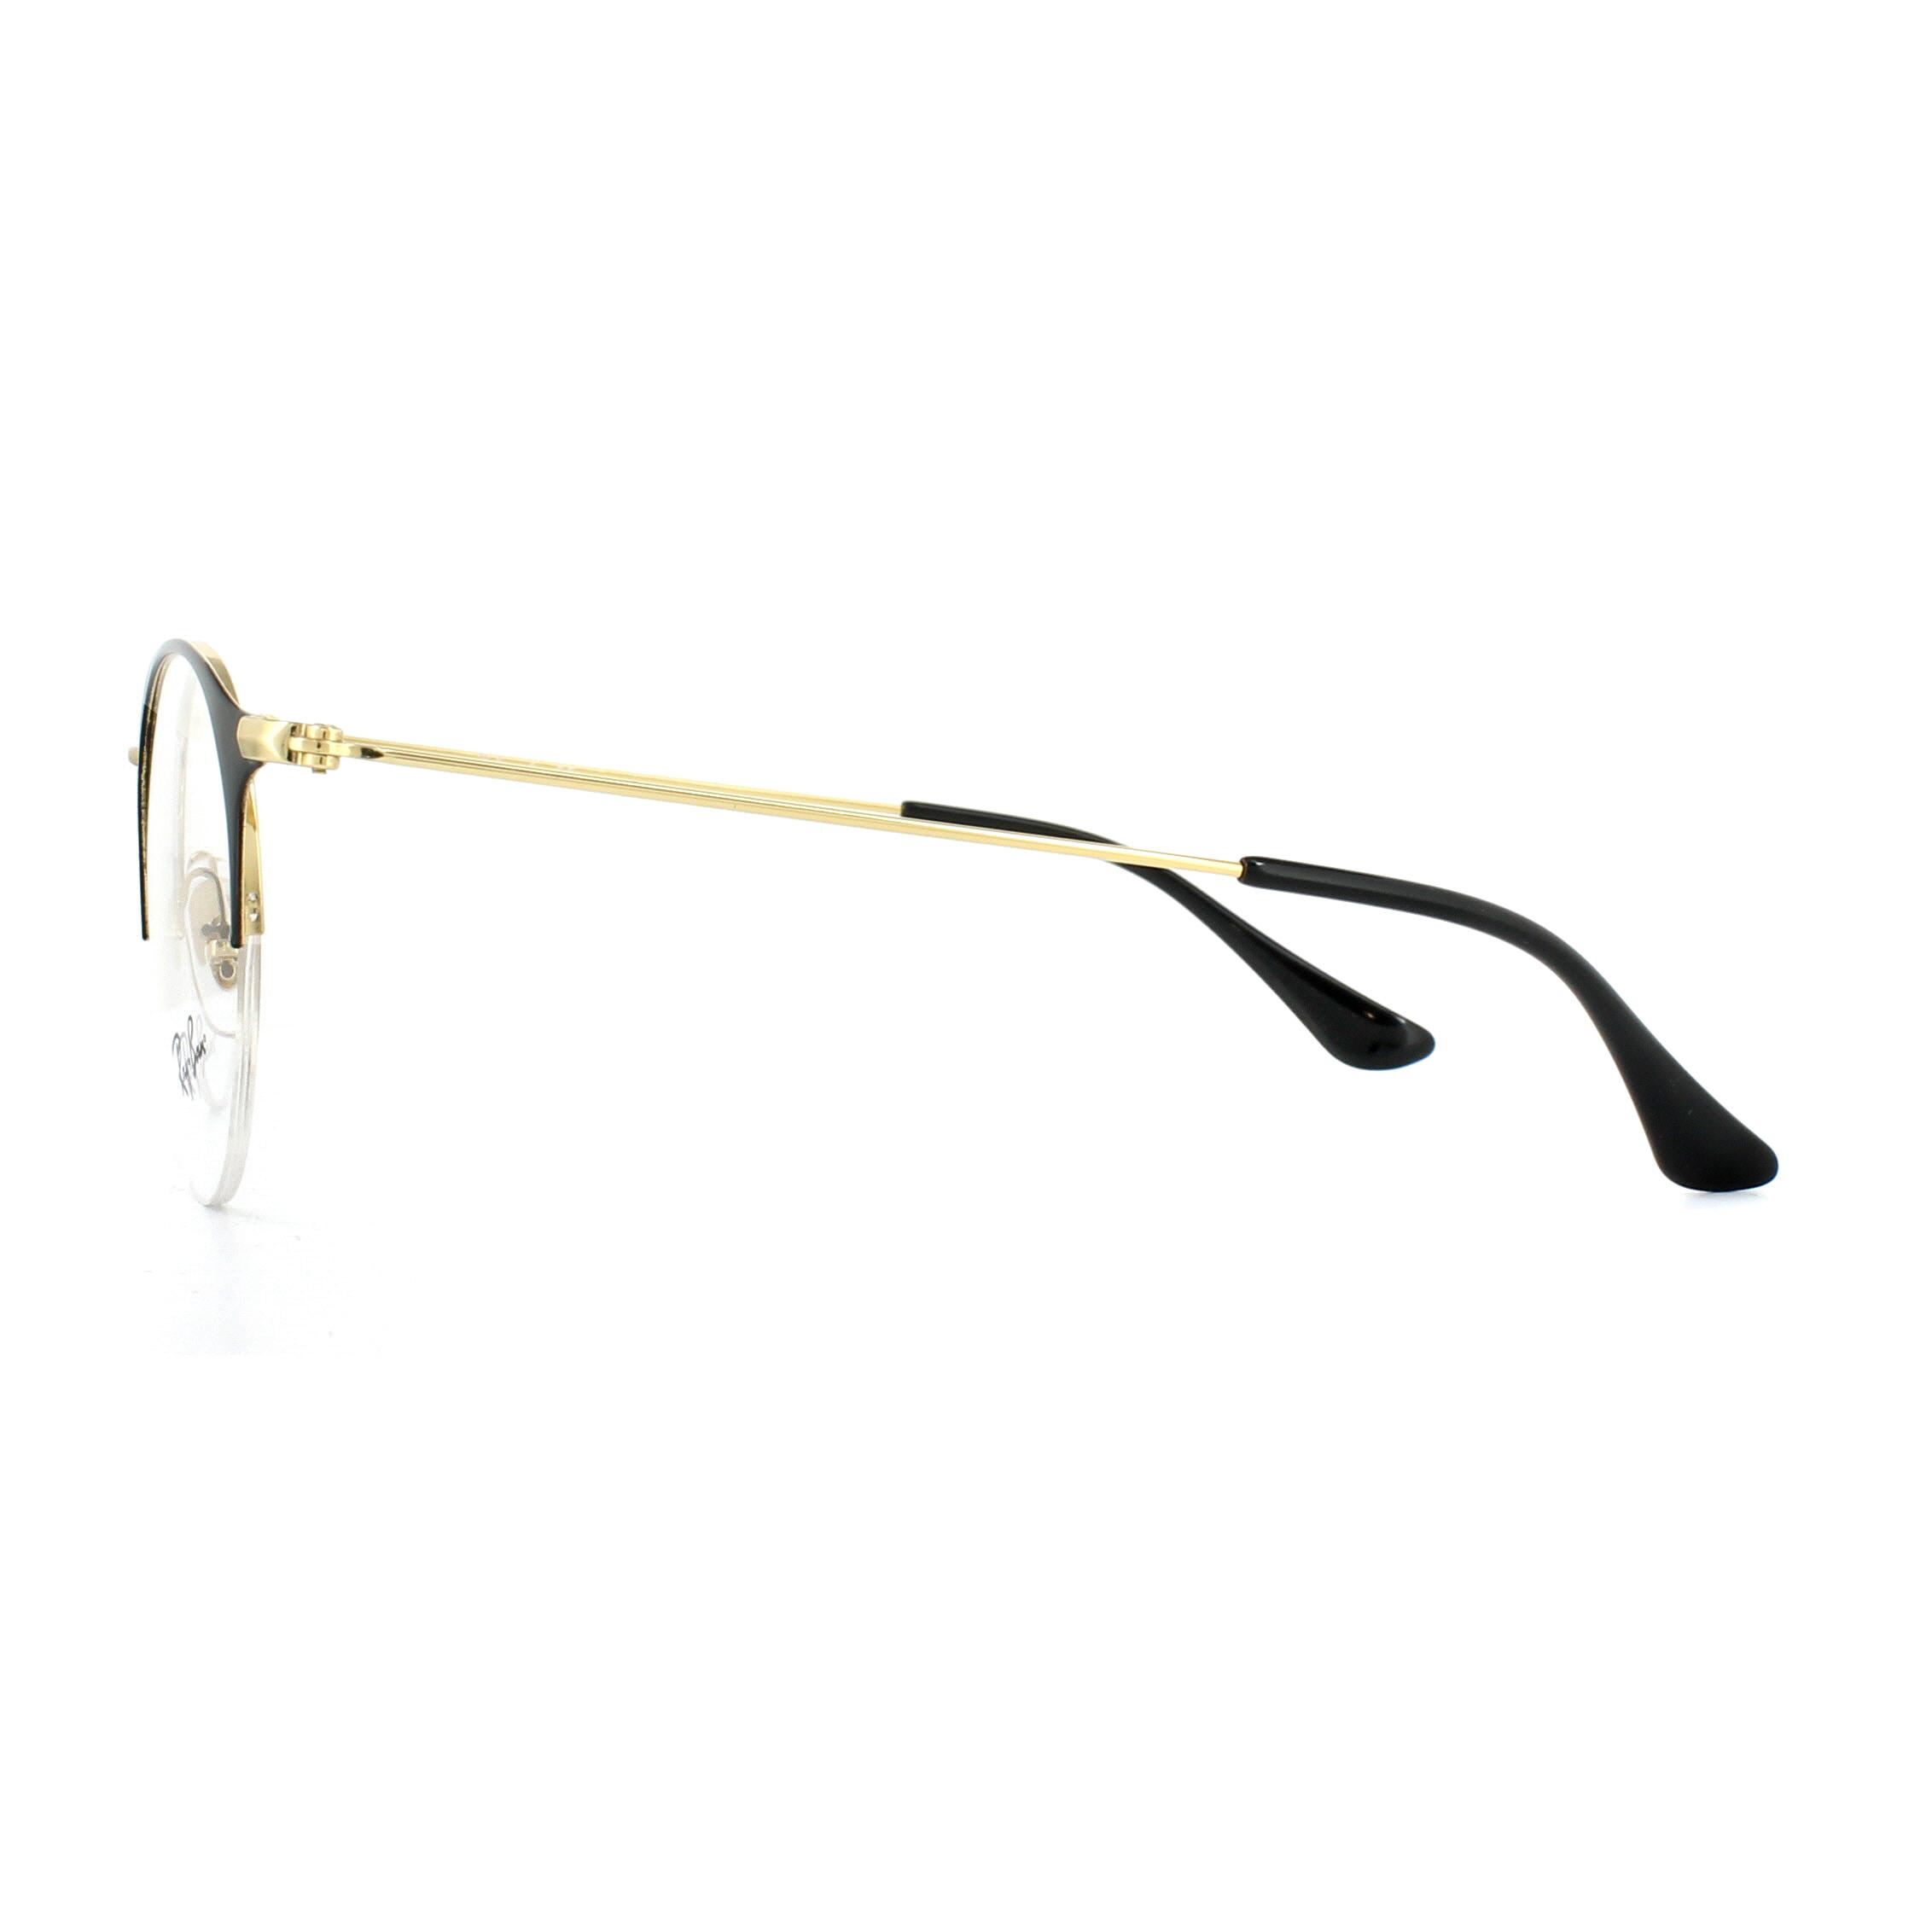 f3ec067bb82 Sentinel Ray-Ban Glasses Frames 3578V 2890 Gold Top Shiny Black 50mm